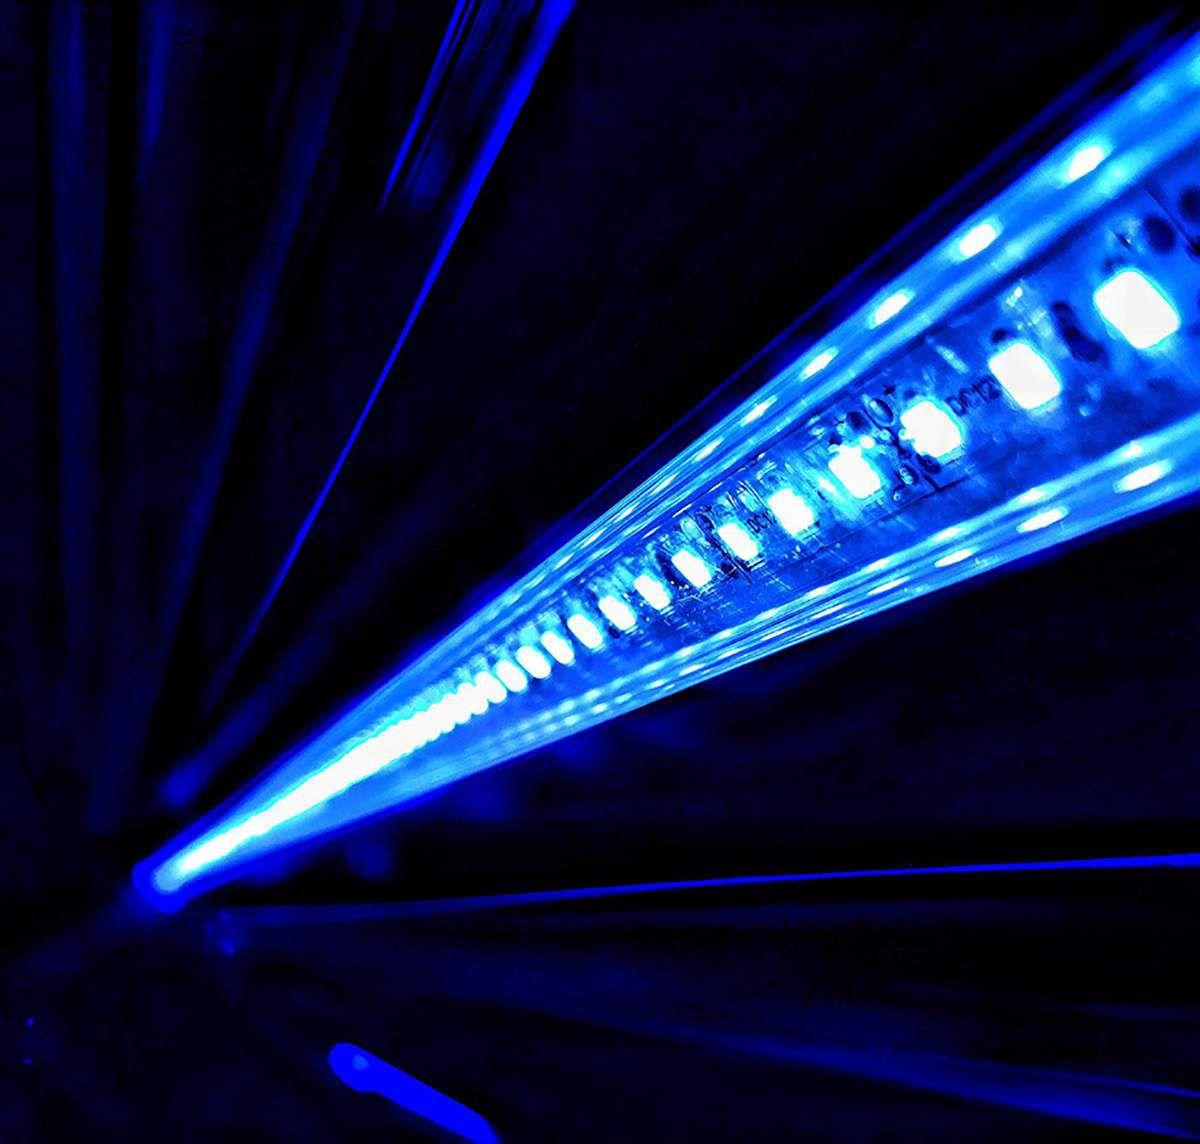 Luminária Althea PacificSun Híbrida T5 4x80W+2x LED 36x150cm